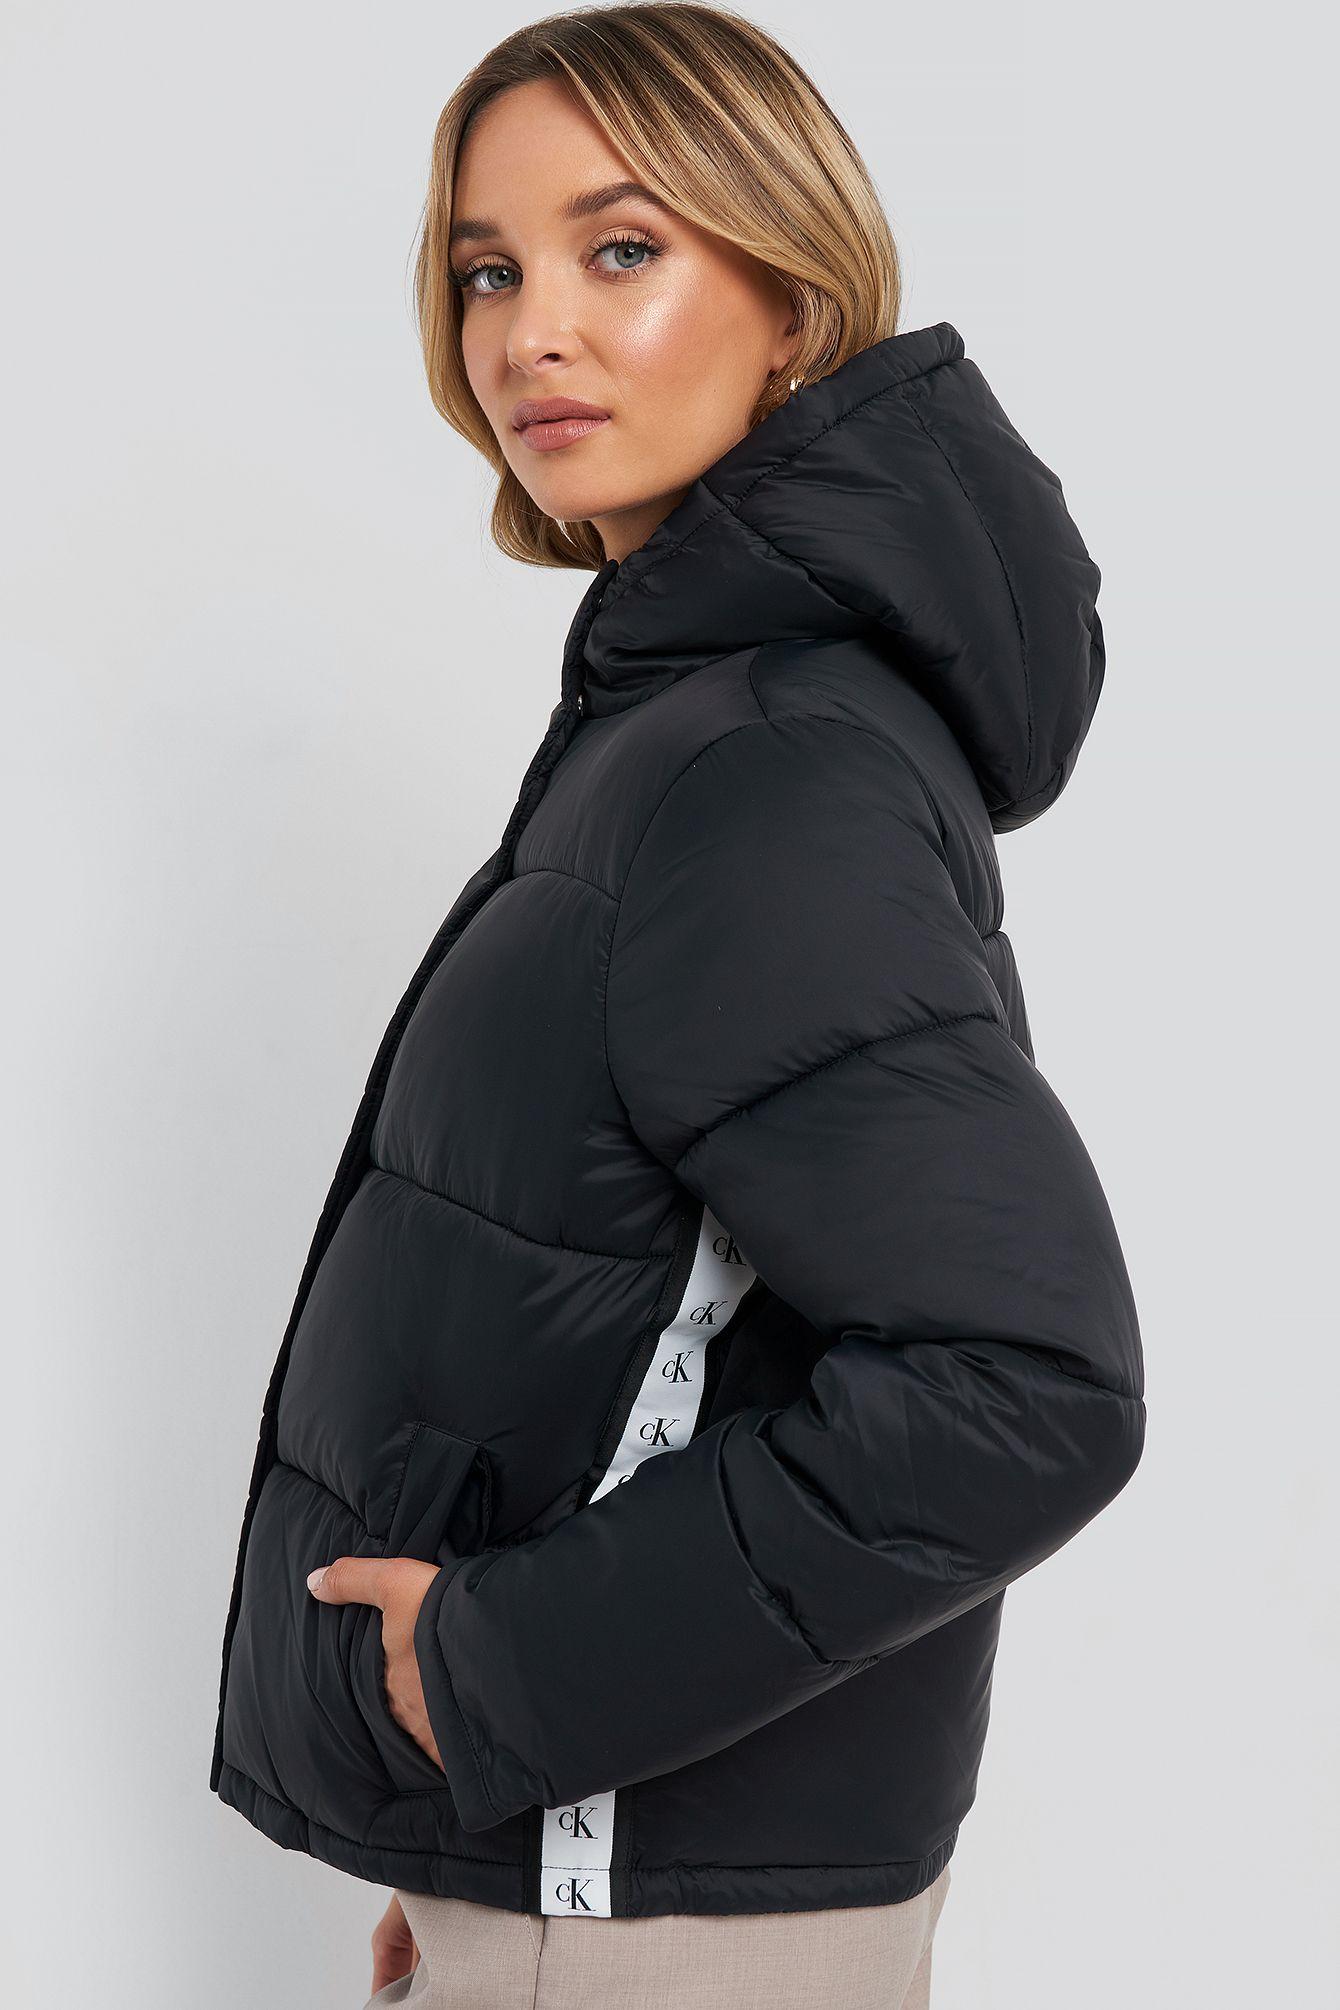 Calvin Klein Monogram Tape Lw Puffer Jacket Black Calvinklein Cloth Puffer Jacket Black Calvin Klein Calvin [ 2010 x 1340 Pixel ]